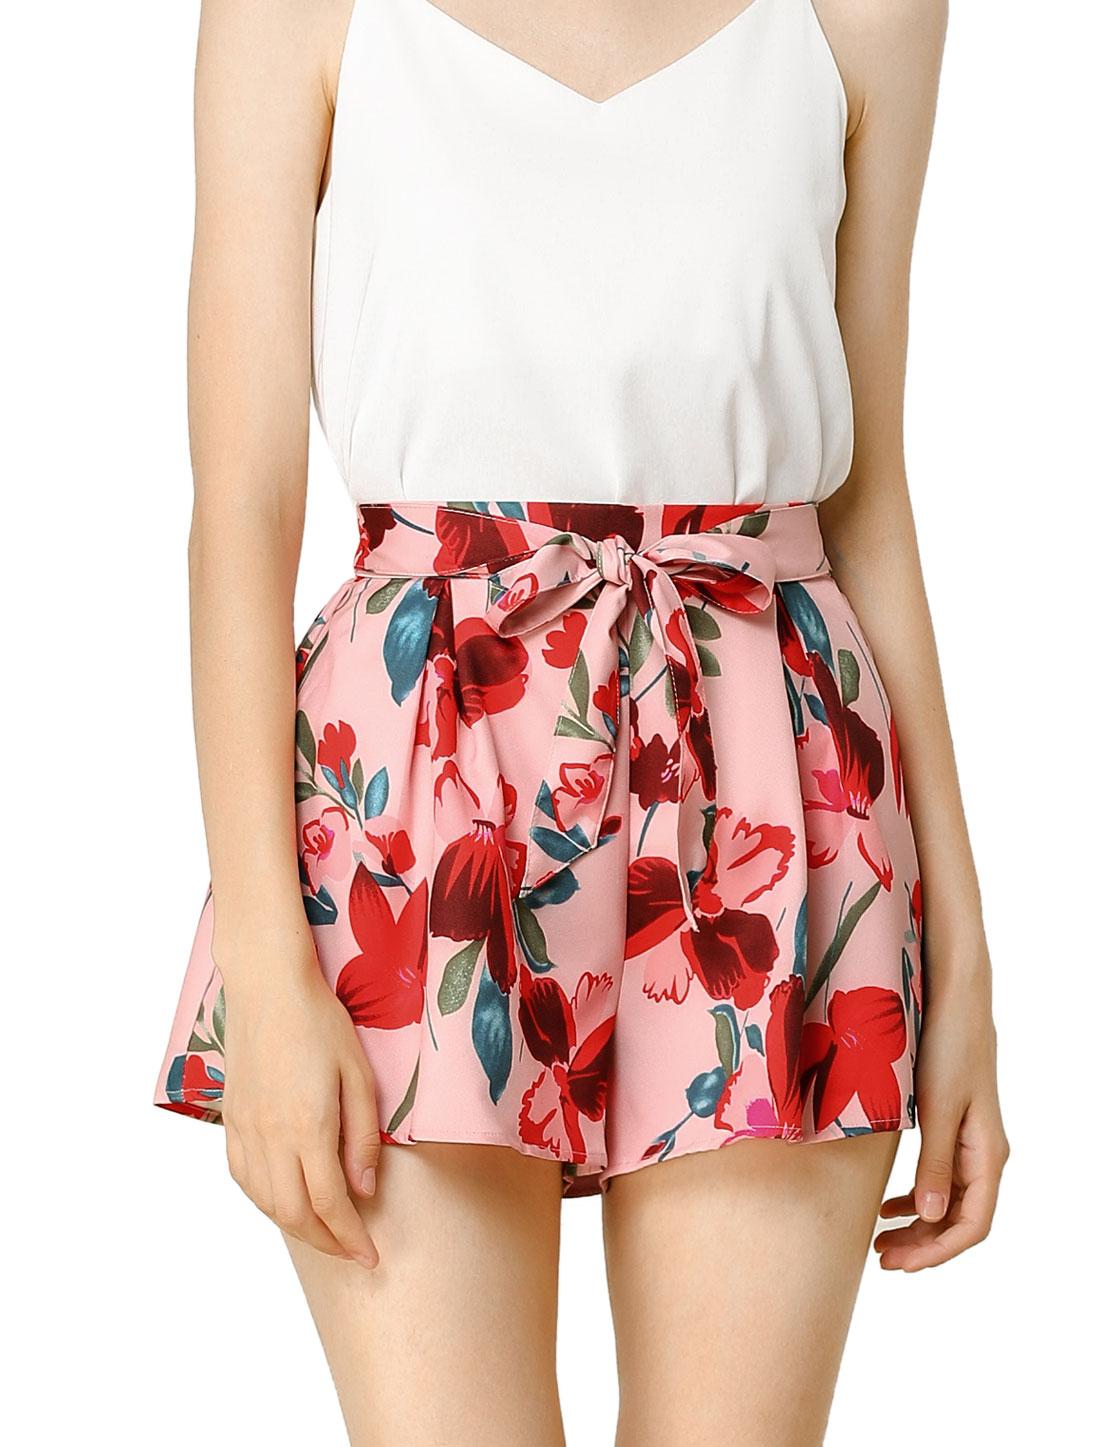 Women Elastic Waist Floral Print Summer Boho Beach Shorts Pink L